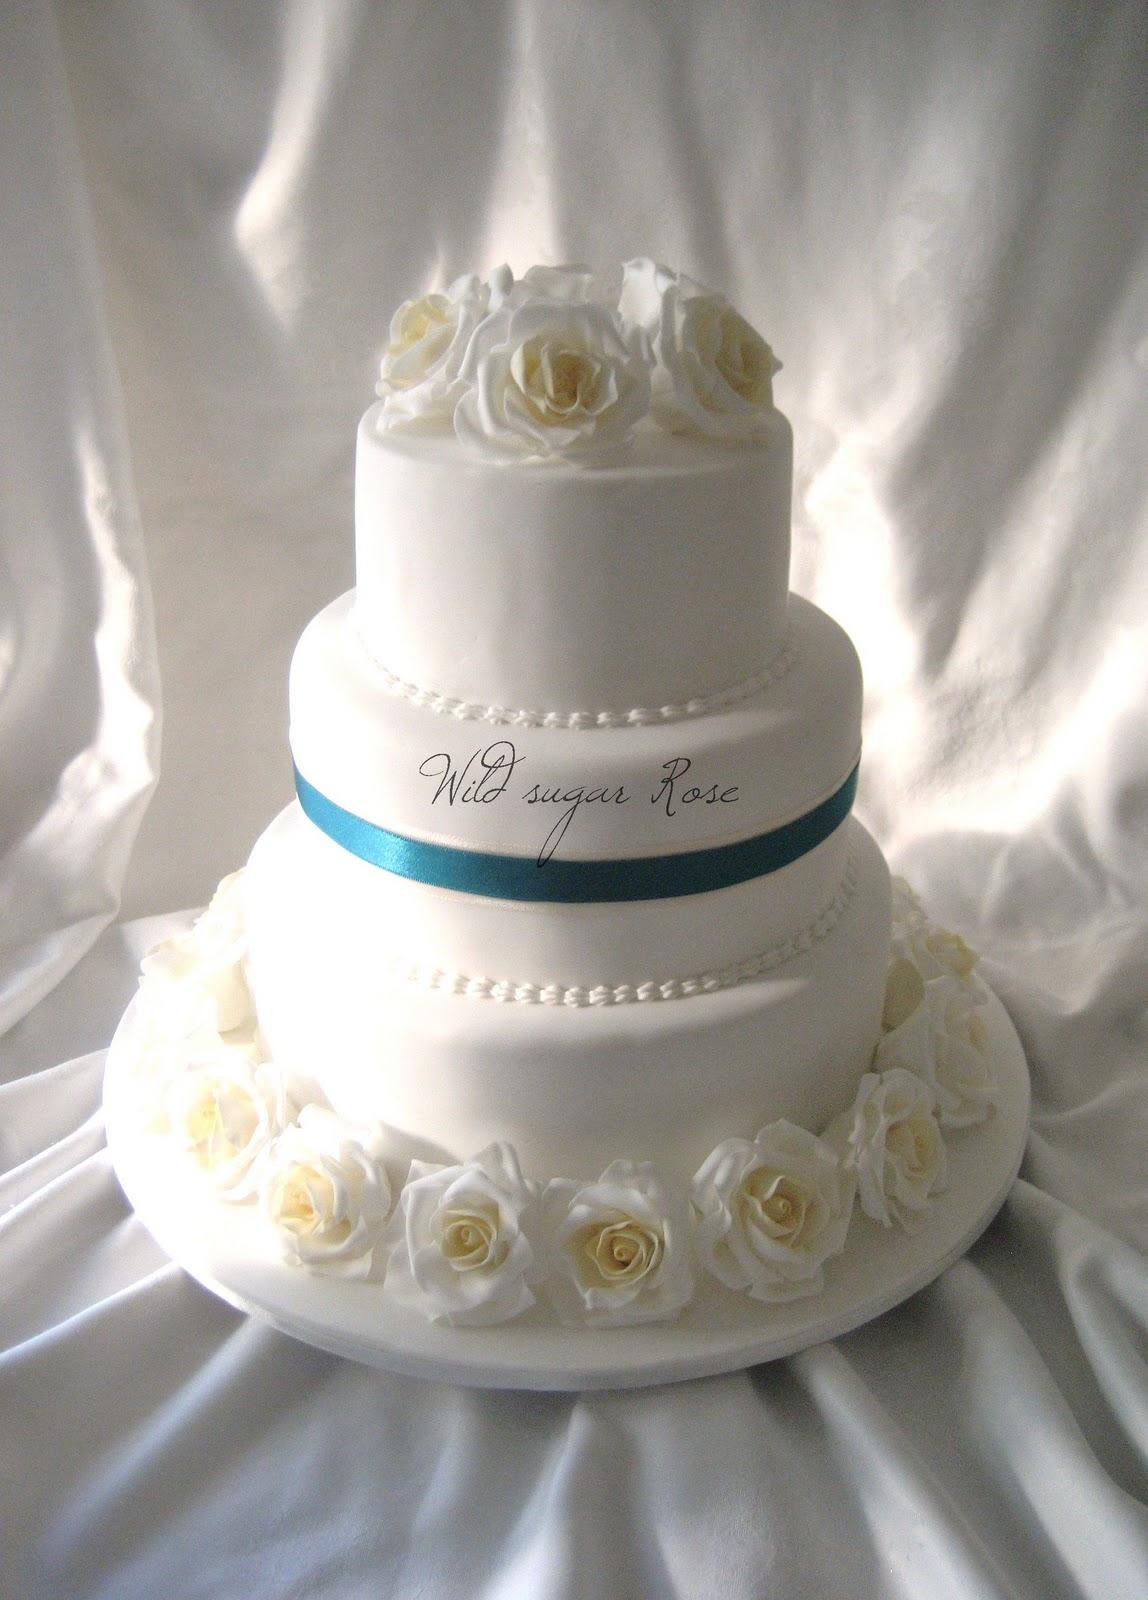 wild sugar rose wedding cakes cupcakes and cake. Black Bedroom Furniture Sets. Home Design Ideas